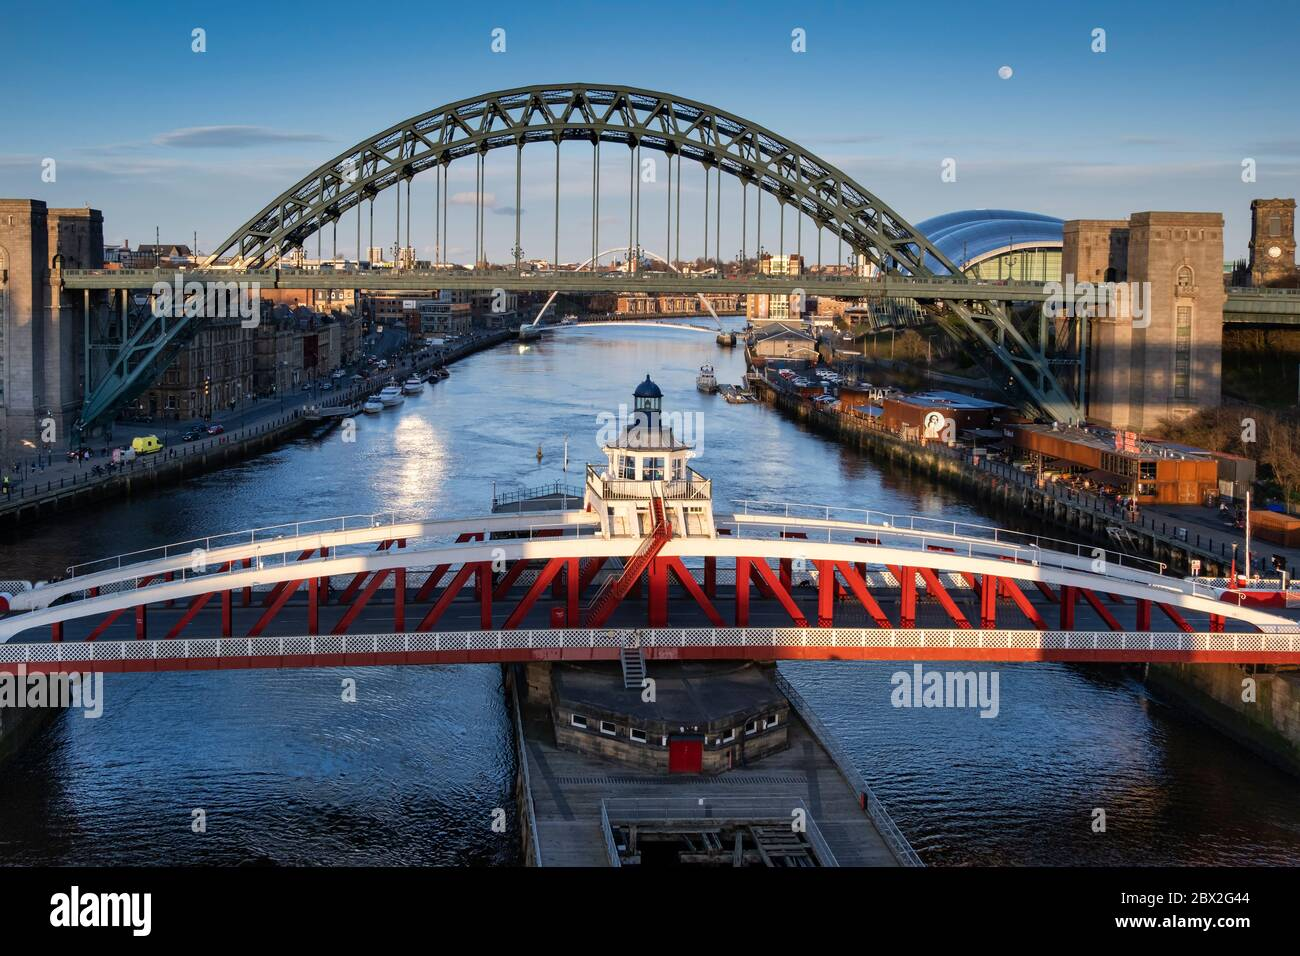 Newcastle Swing Bridge, Tyne Bridge and River Tyne, Newcastle Upon Tyne, Tyne & Wear England, UK Stock Photo